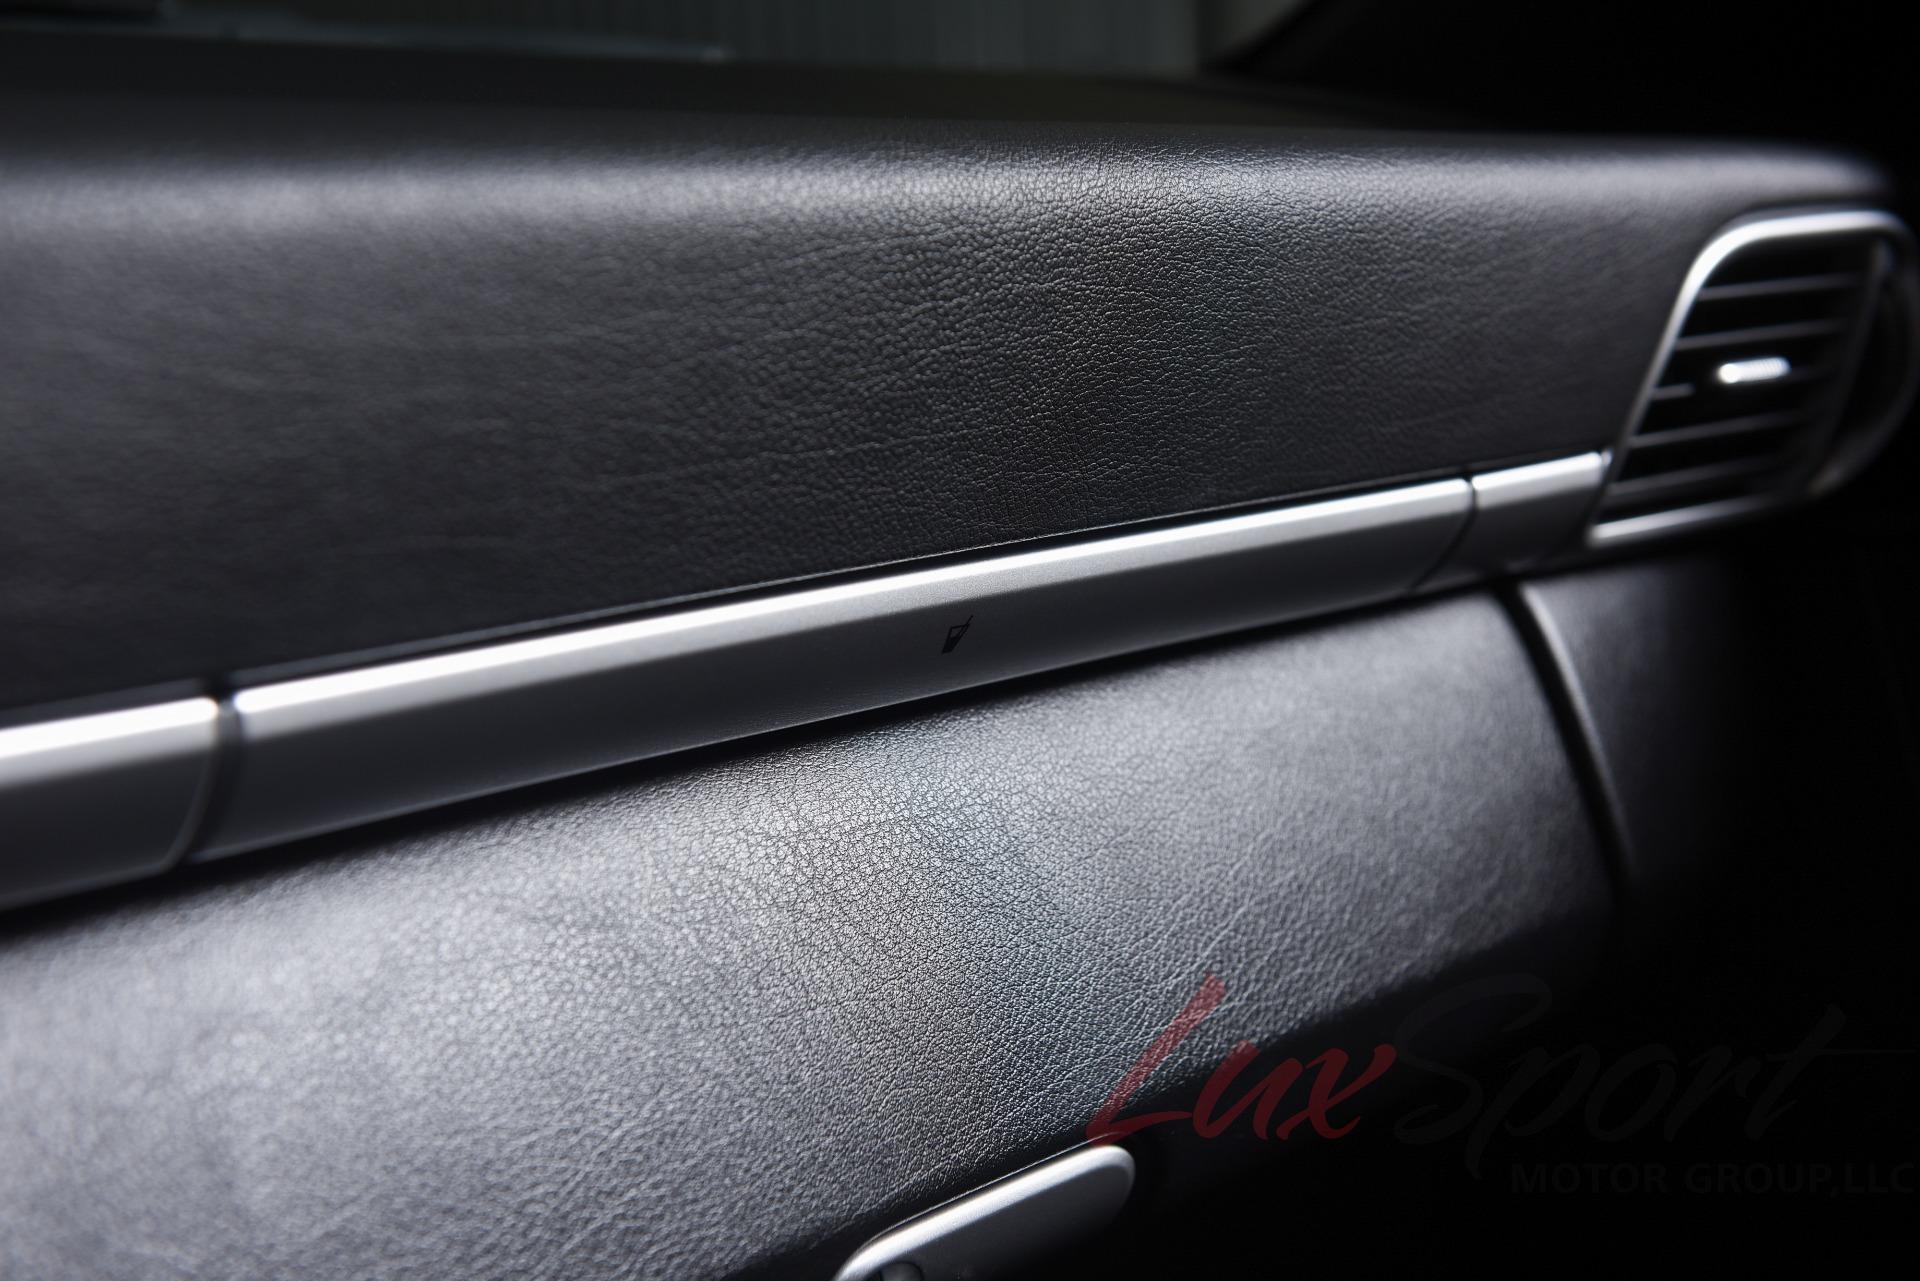 Used 2009 Porsche 997.2 Carrera S Cabriolet  | Syosset, NY